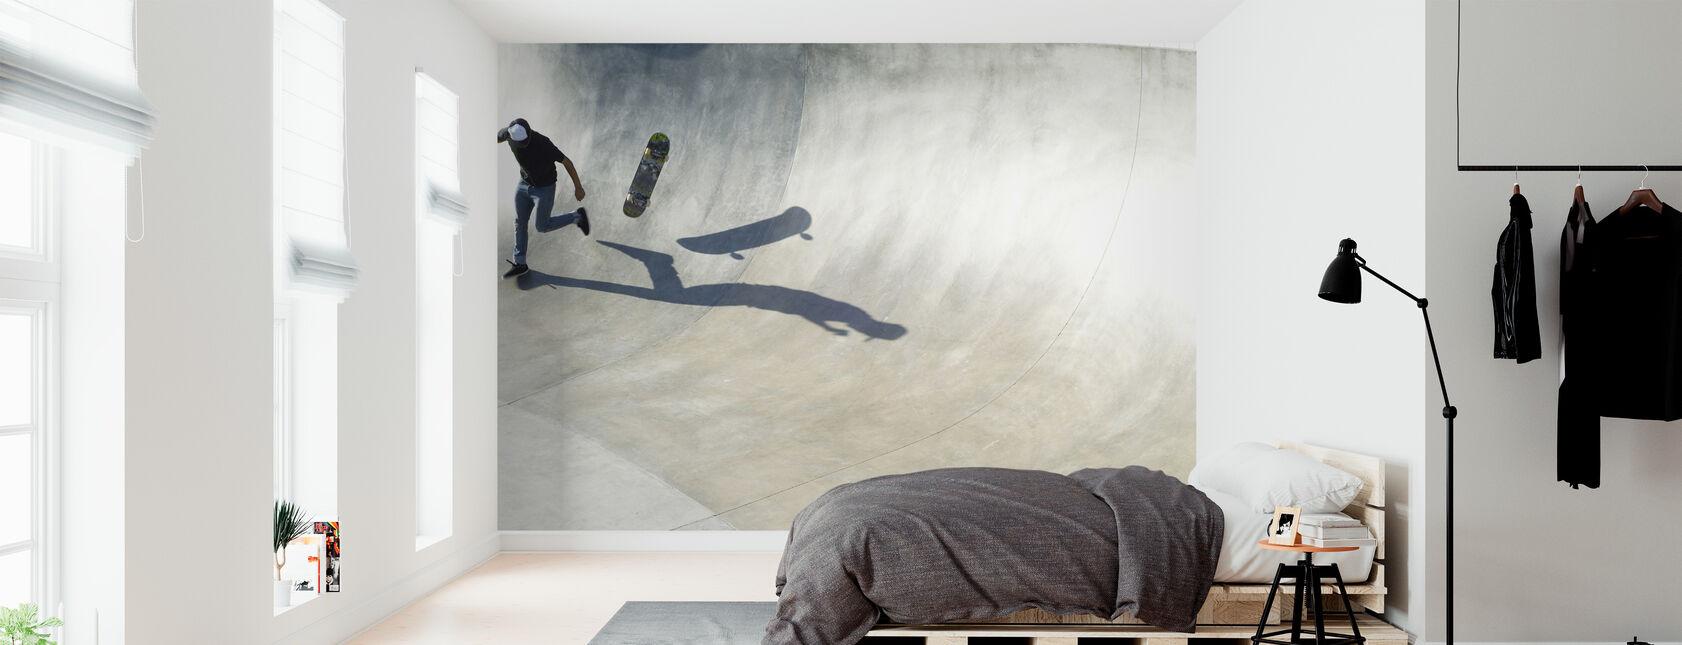 Skateboarder - Wallpaper - Bedroom